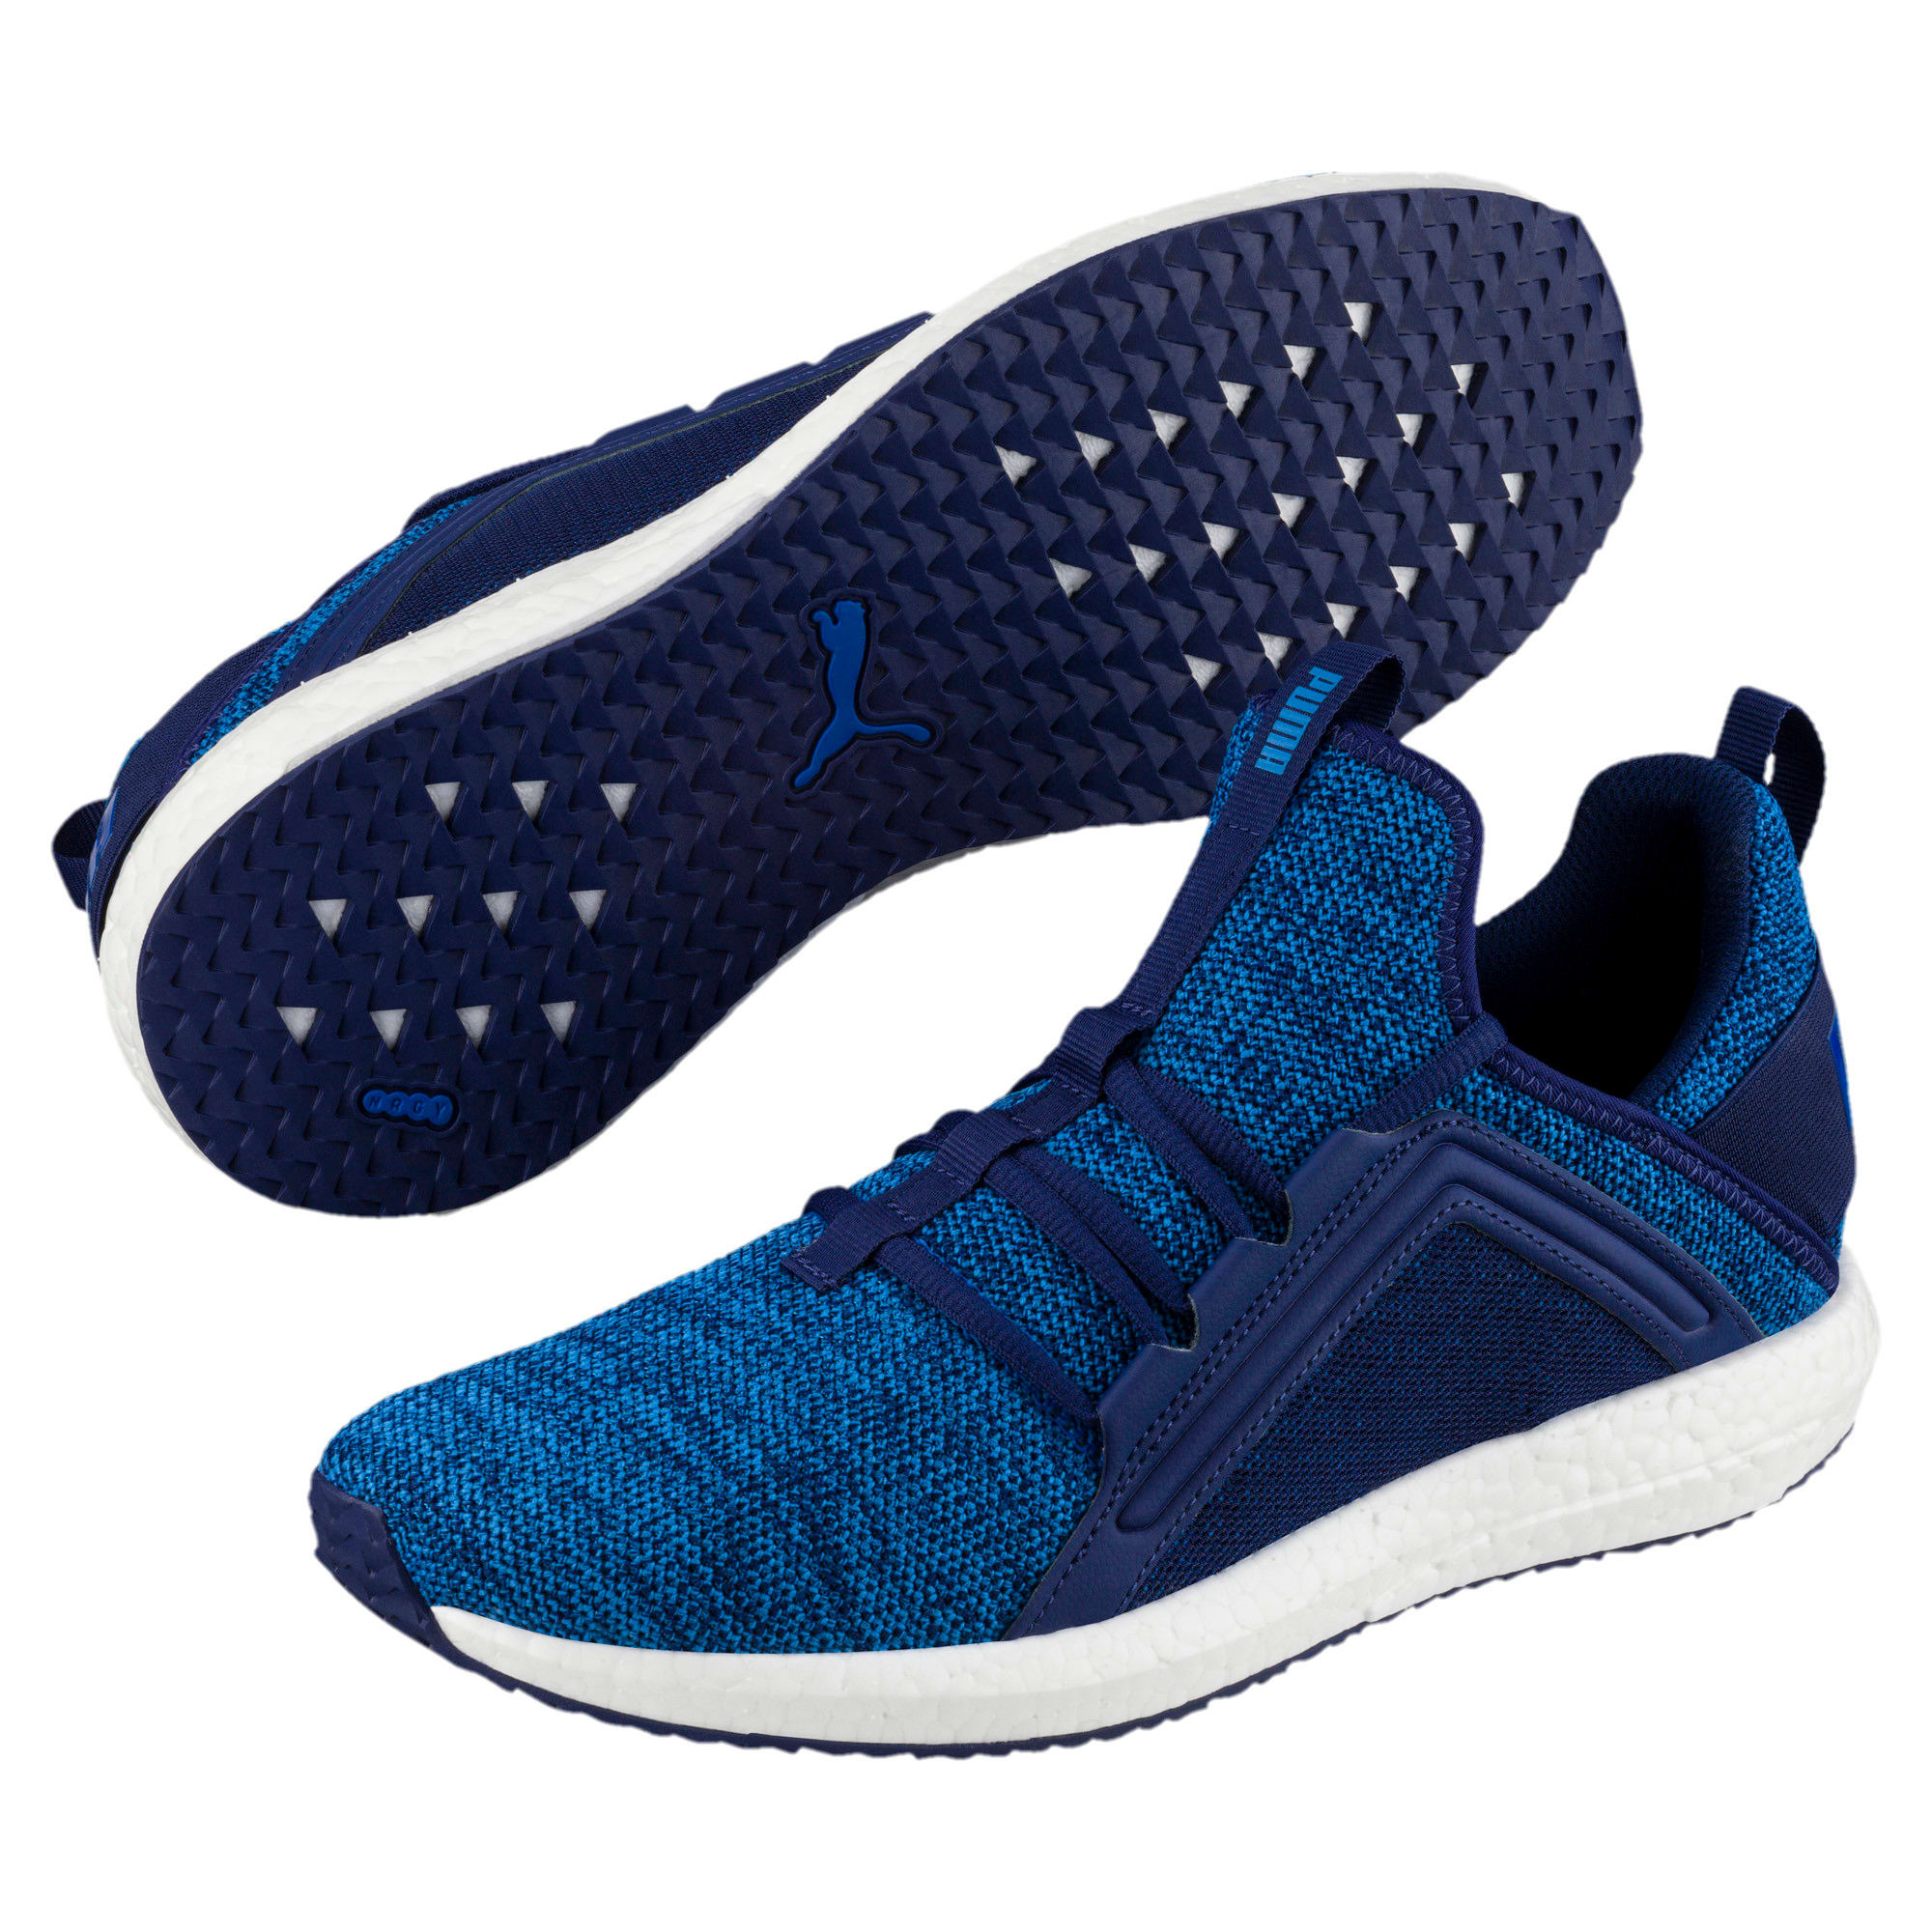 Thumbnail 2 of Mega NRGY Knit Men's Trainers, Blue Depths-Lapis Blue, medium-IND